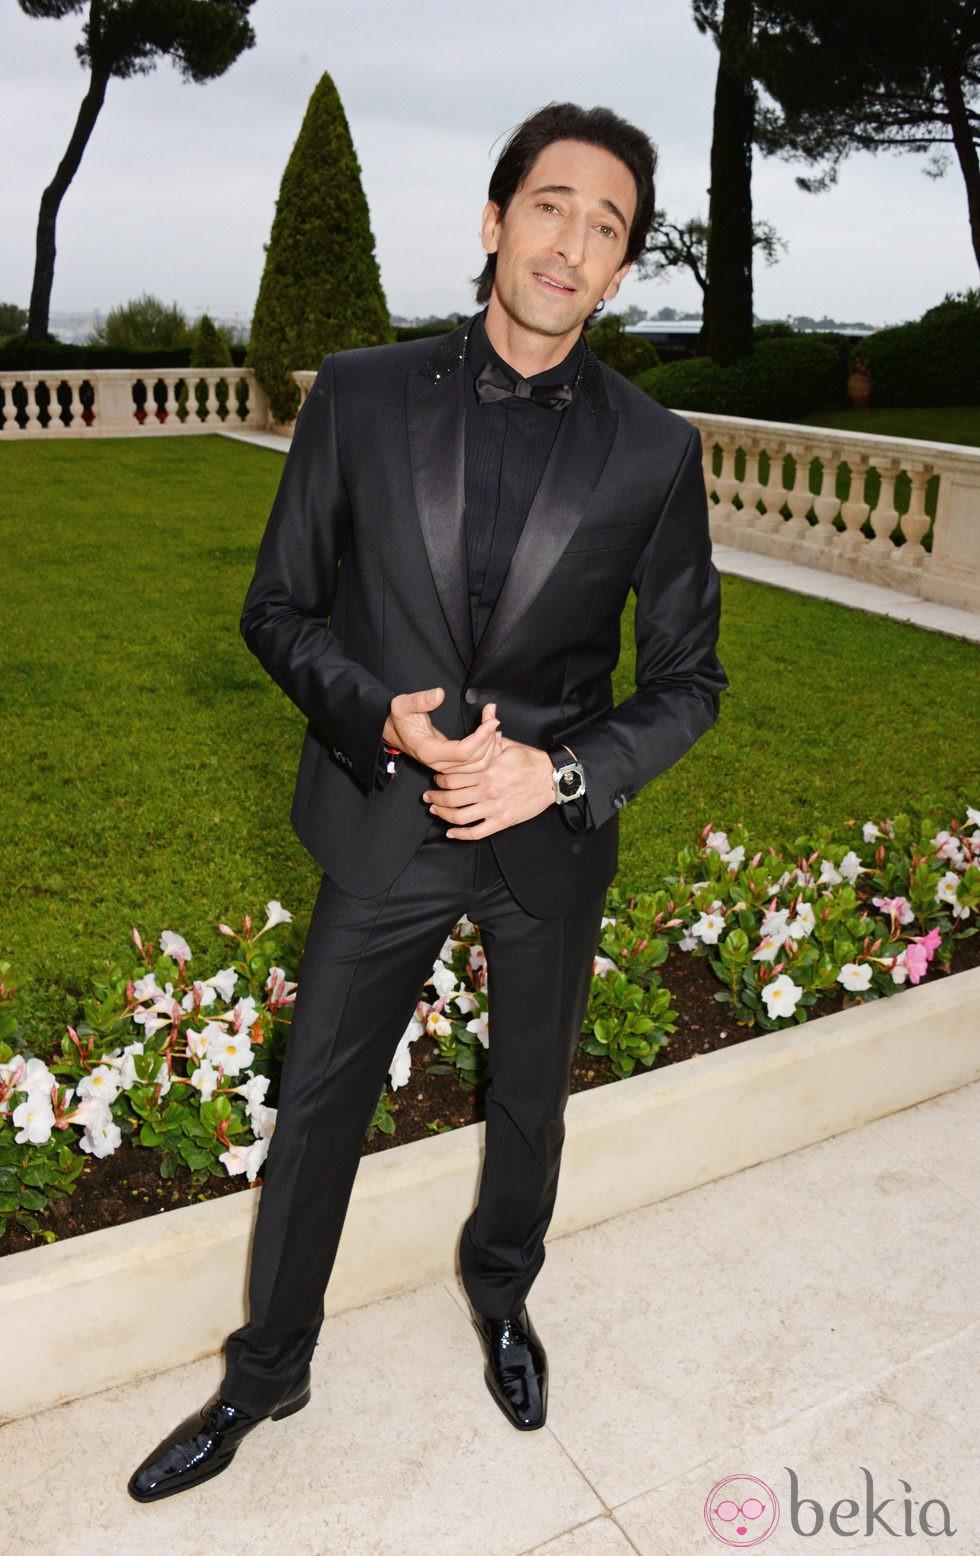 Adrien Brody en la gala amfAR del Festival de Cannes 2014